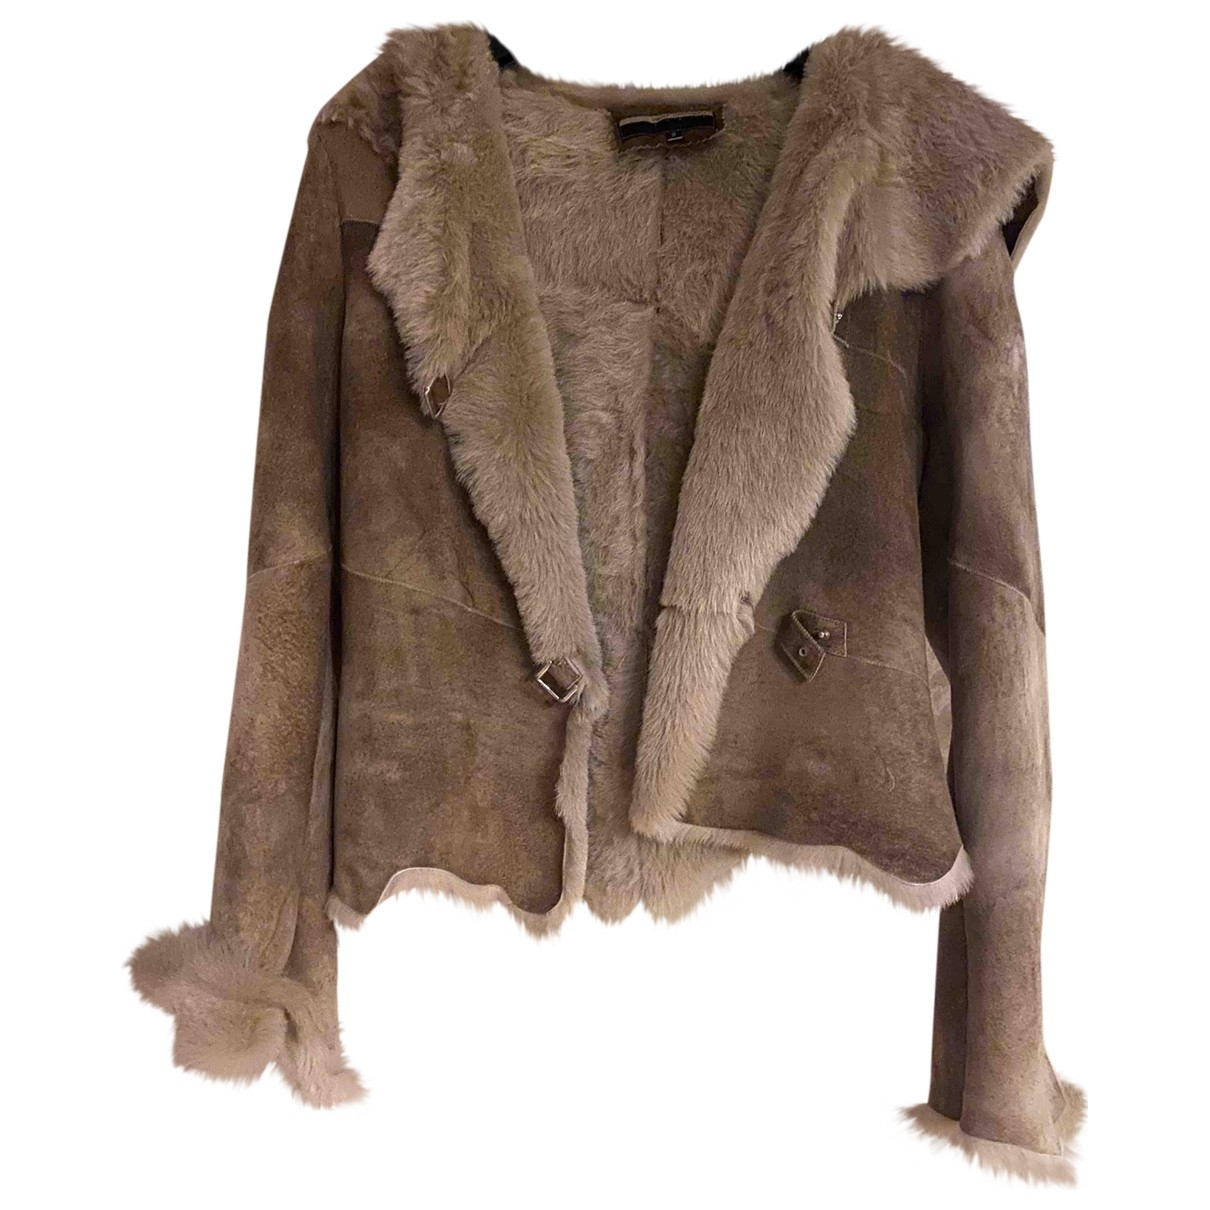 Ventcouvert \N Camel Rabbit Leather jacket for Women 1 0-5